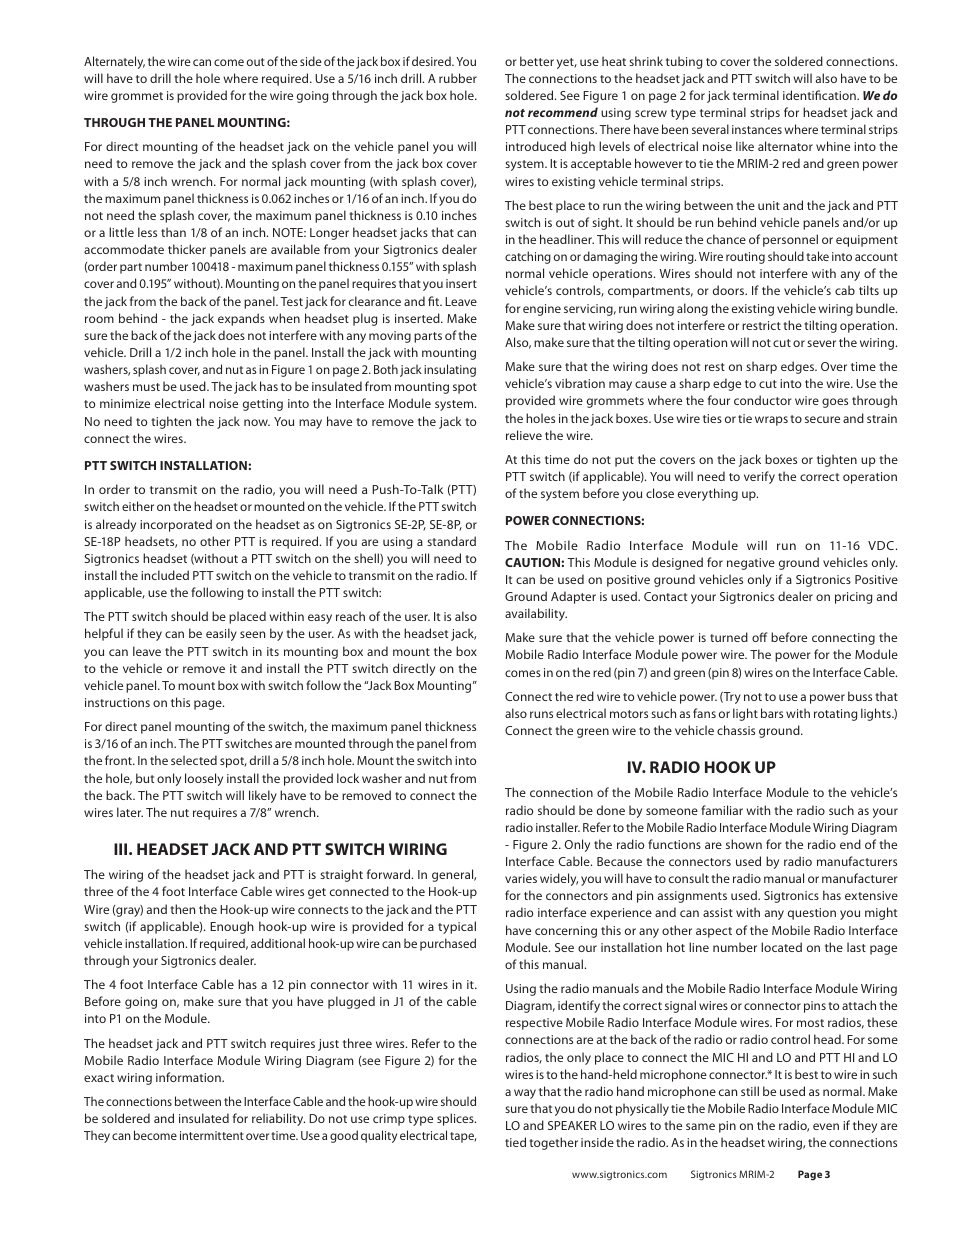 Sigtronics Wiring Diagram | Machine Repair Manual on